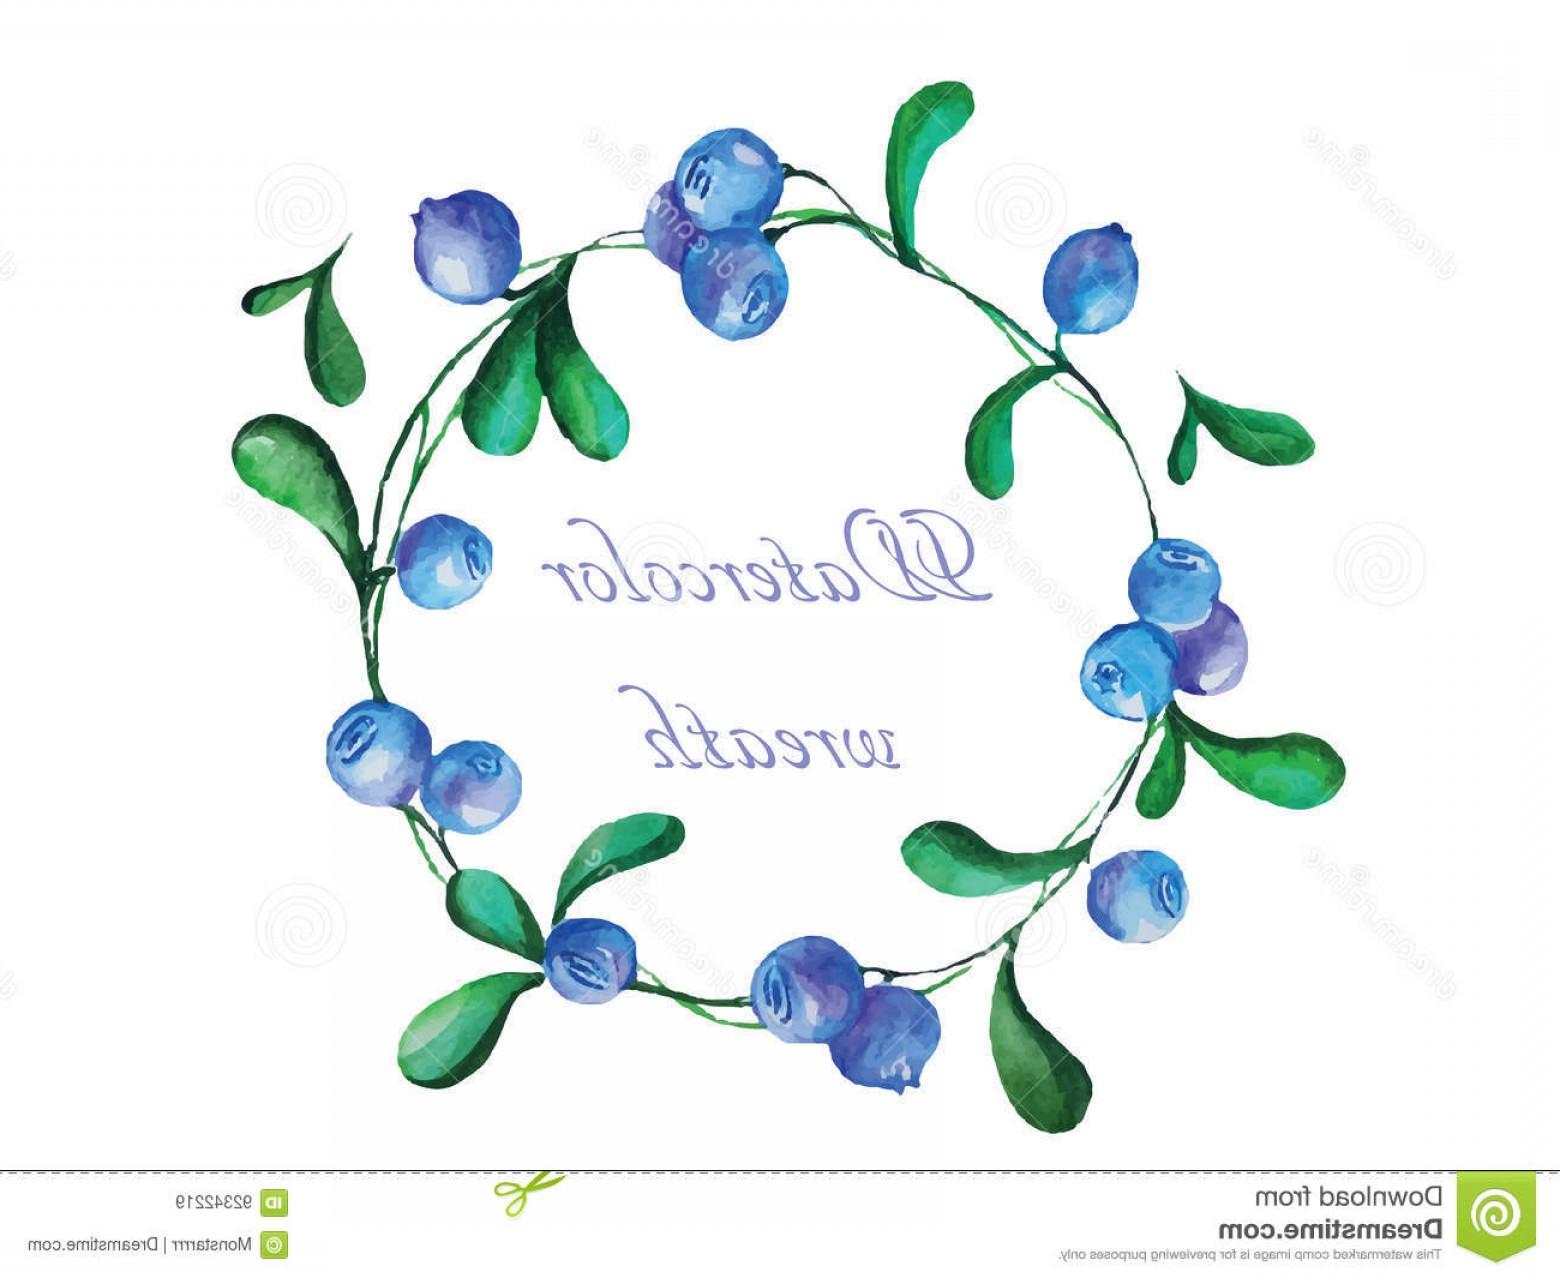 1560x1278 Stock Illustration Watercolor Wreath Vector Illustration Colorful